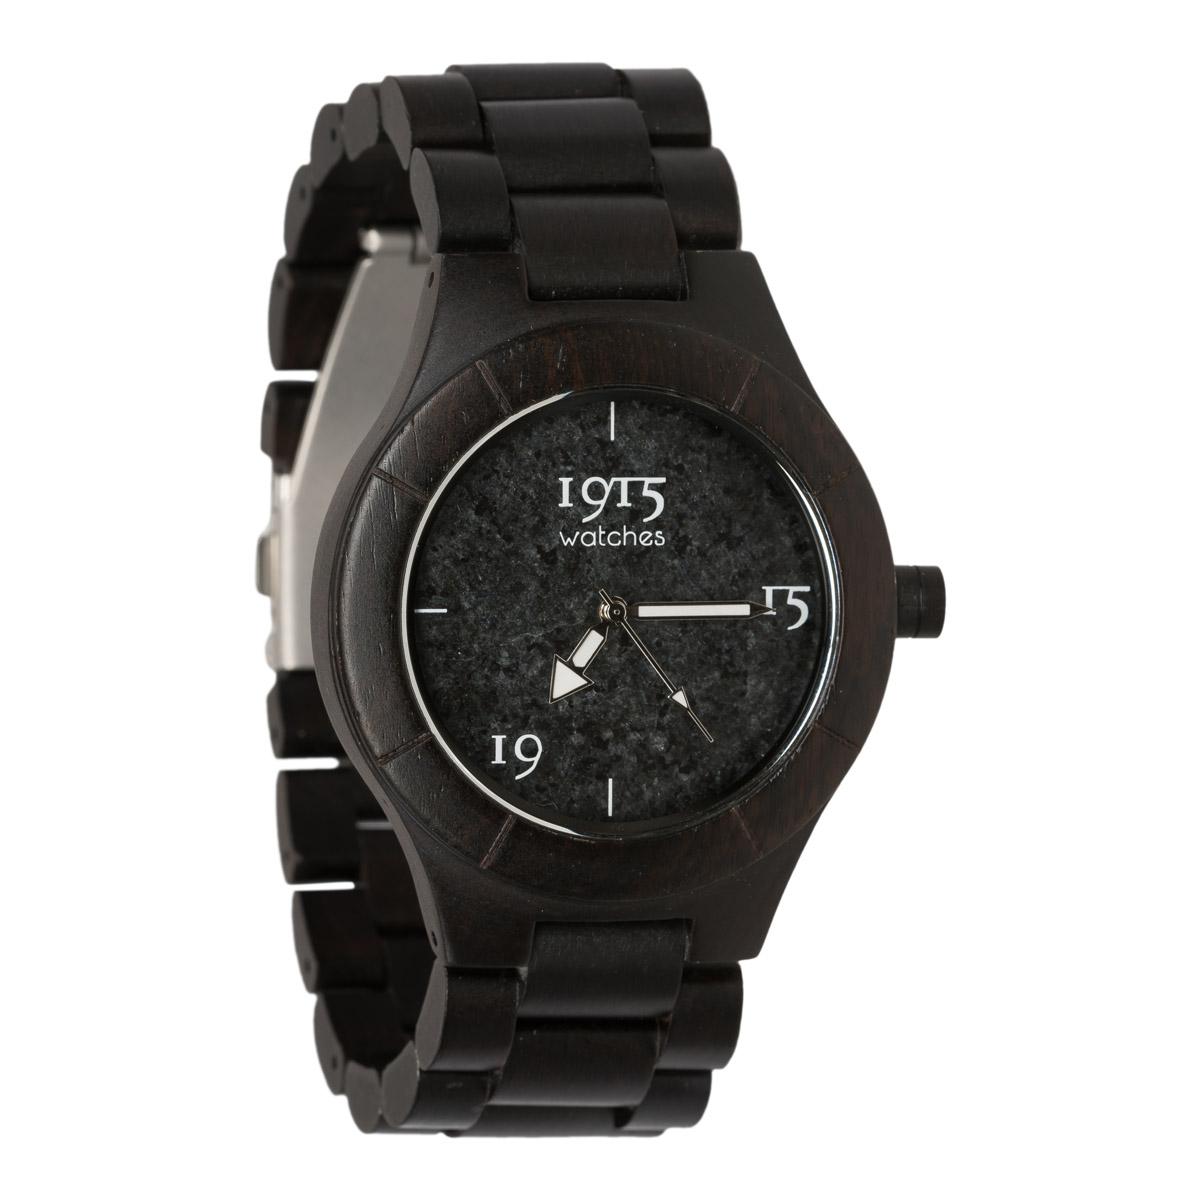 Image of 1915 Watch Elegance Men Grey Stone 46 mm Horloge 12312